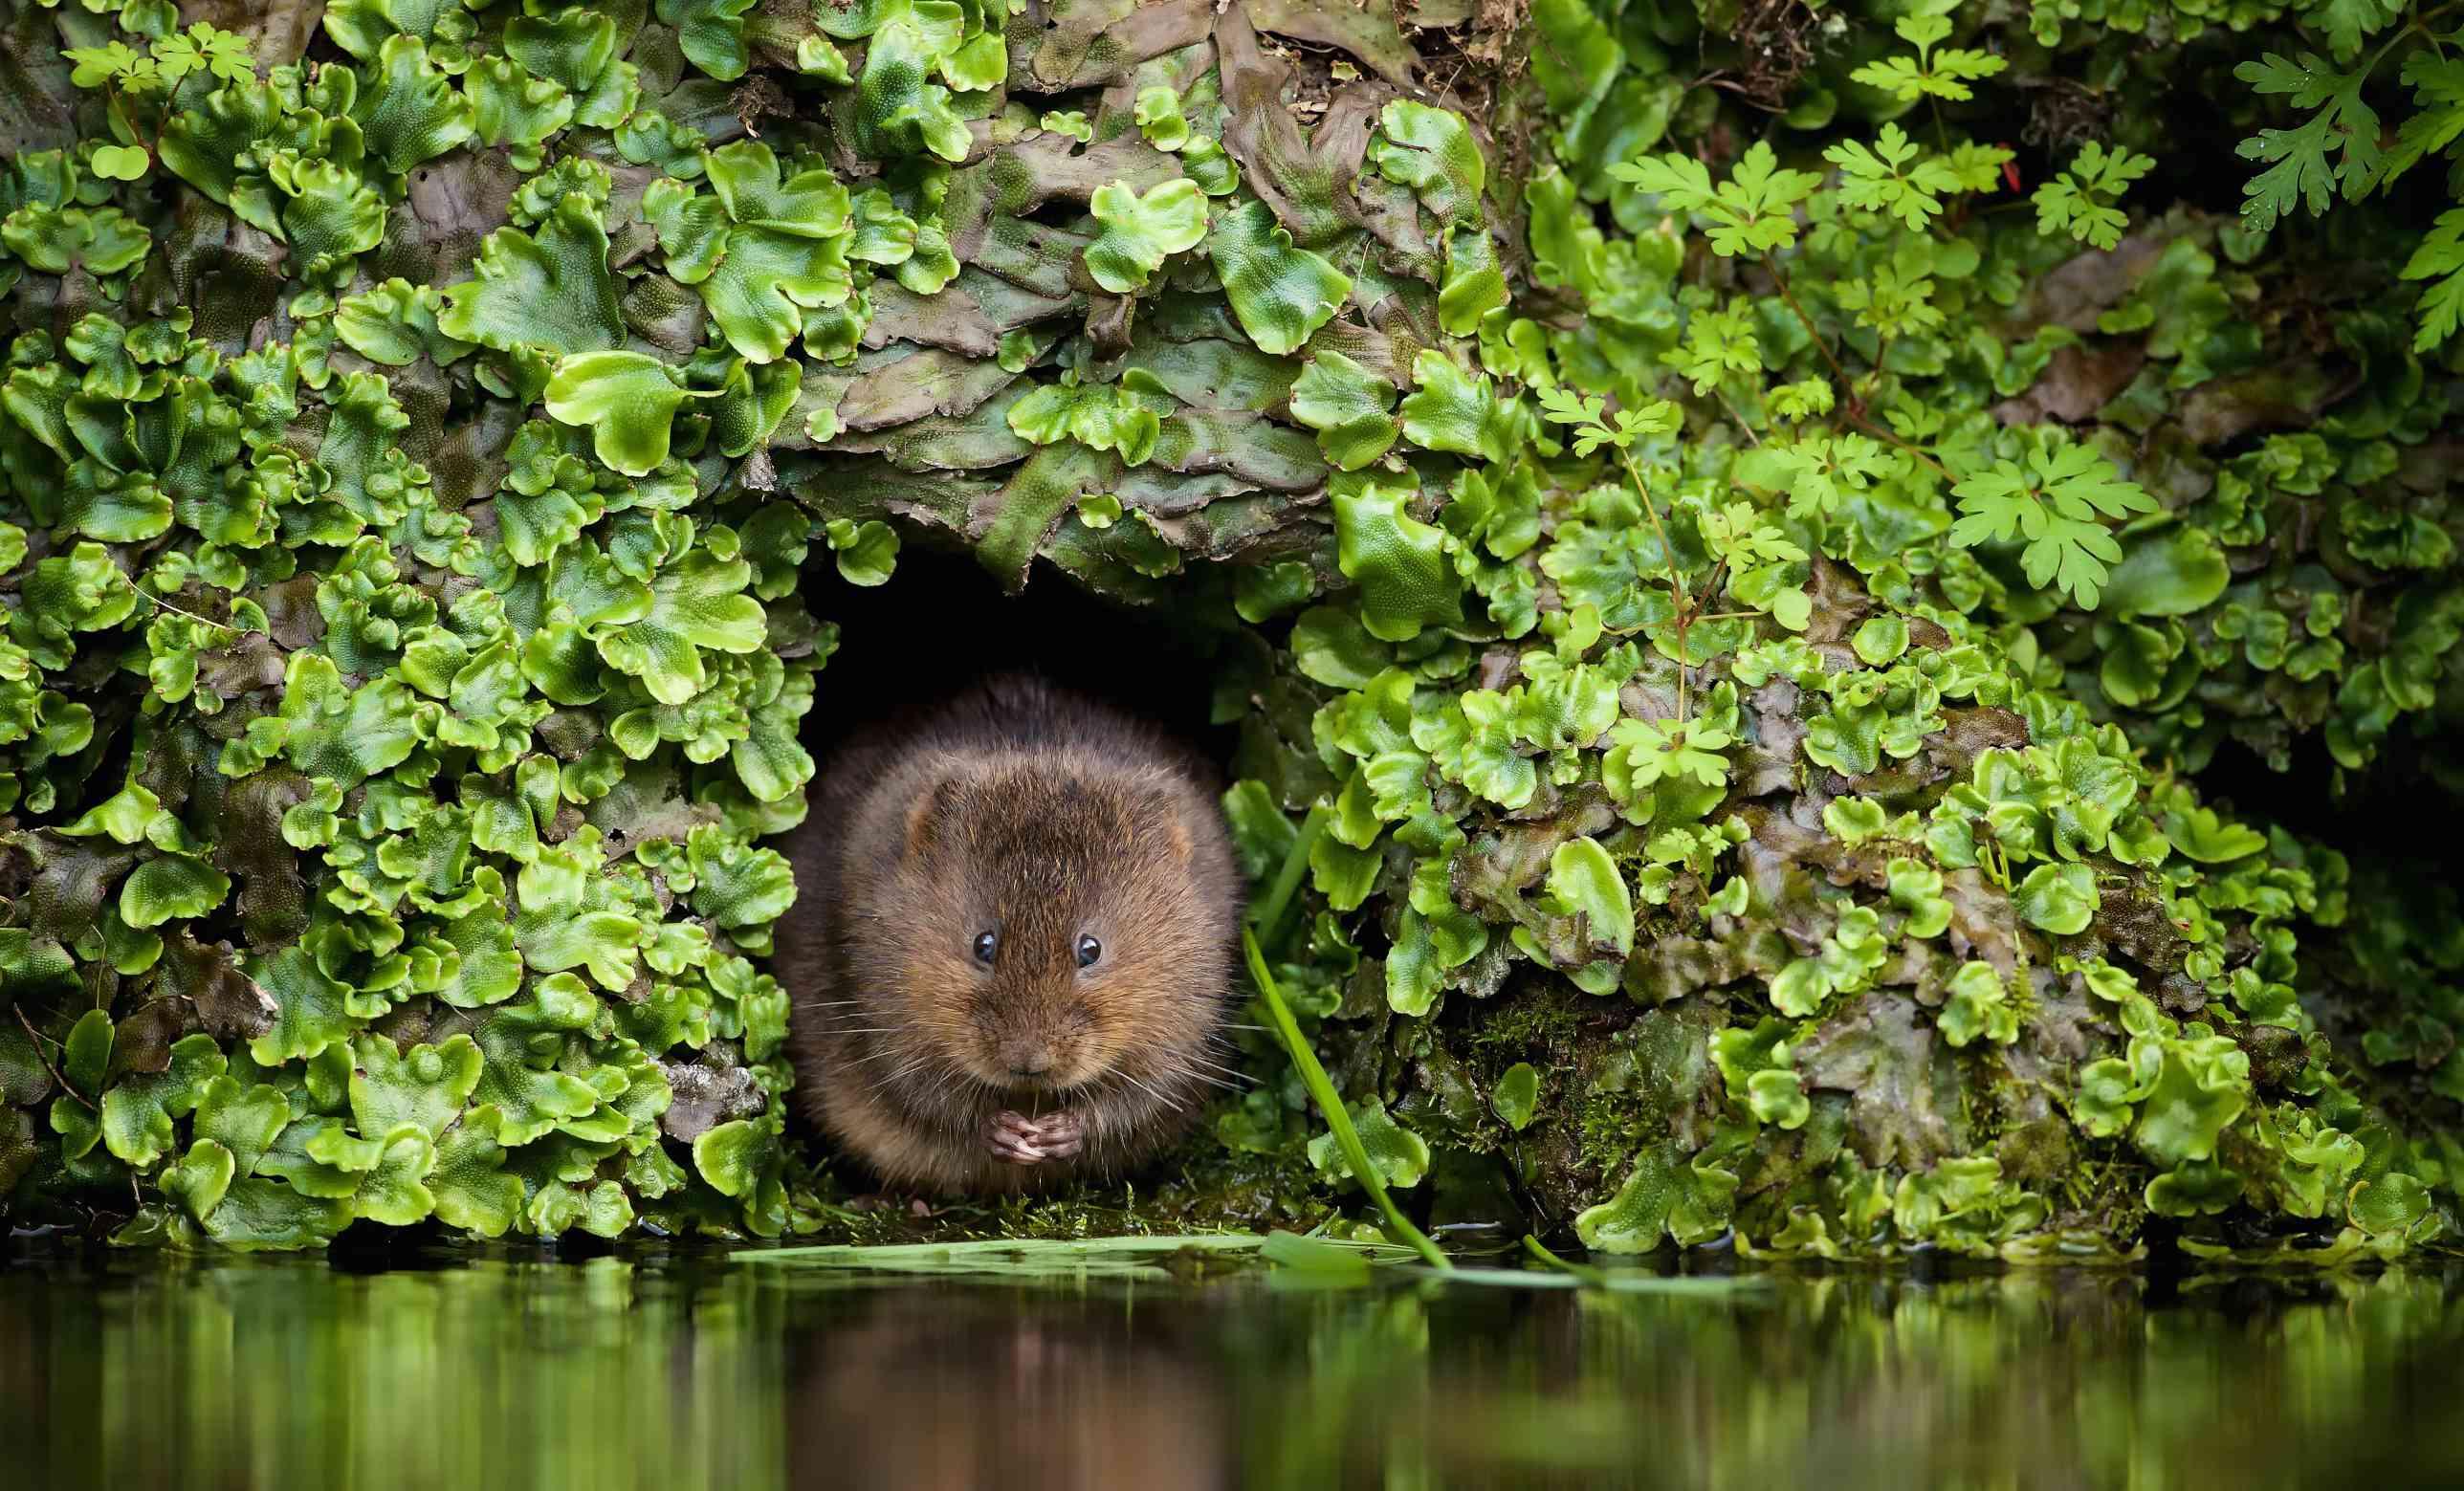 A vole in a hole near water.